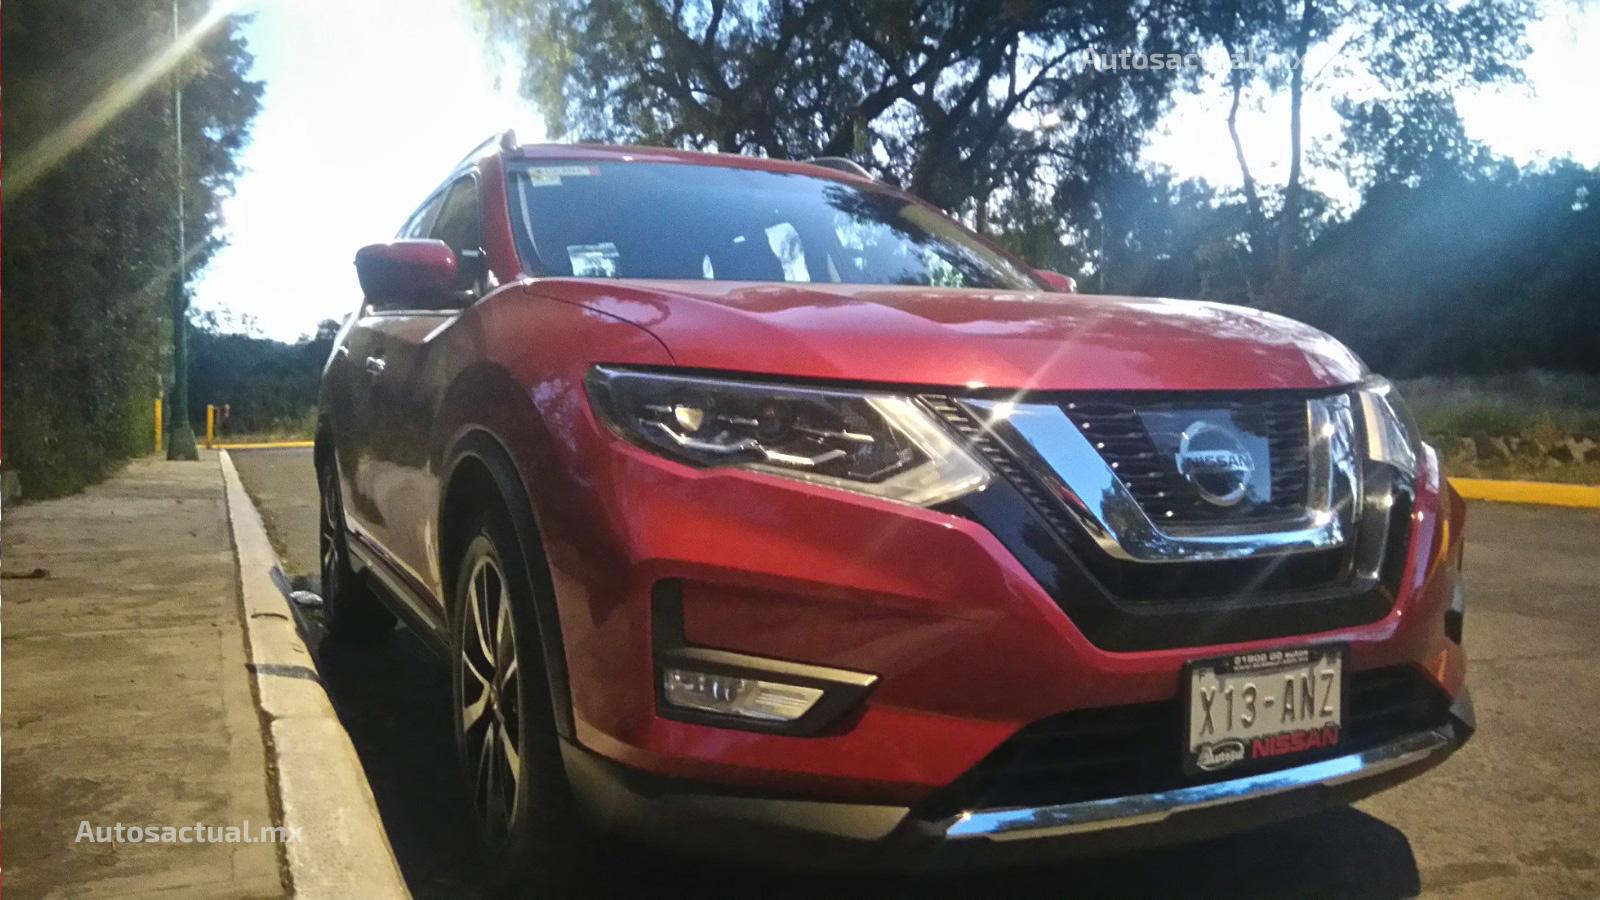 Nissan X-Trail 2018 en prueba y análisis a fondo